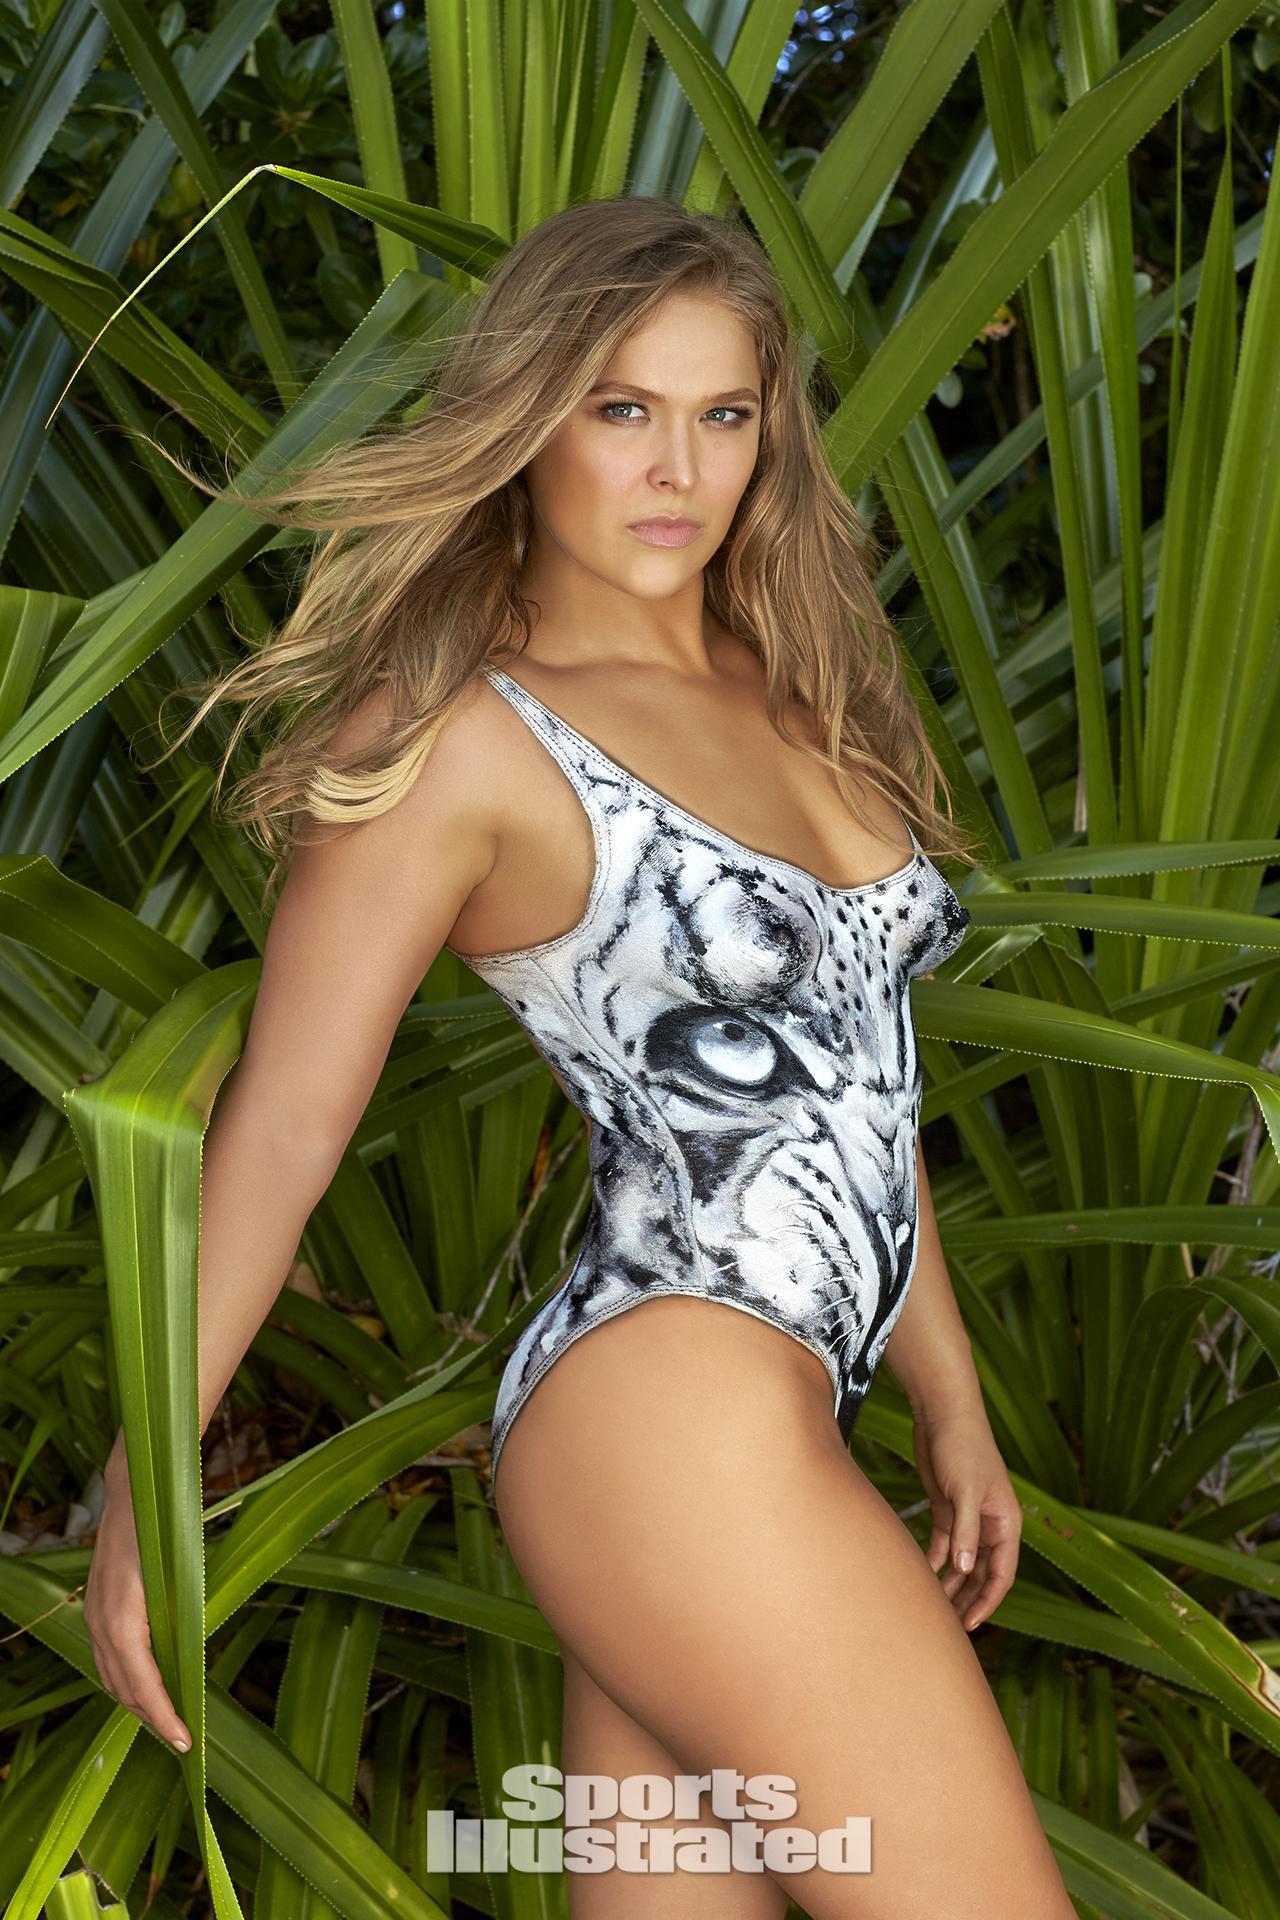 Ronda Rousey Swimsuit Body Paint Photos, Sports Illustrated Swimsuit ...